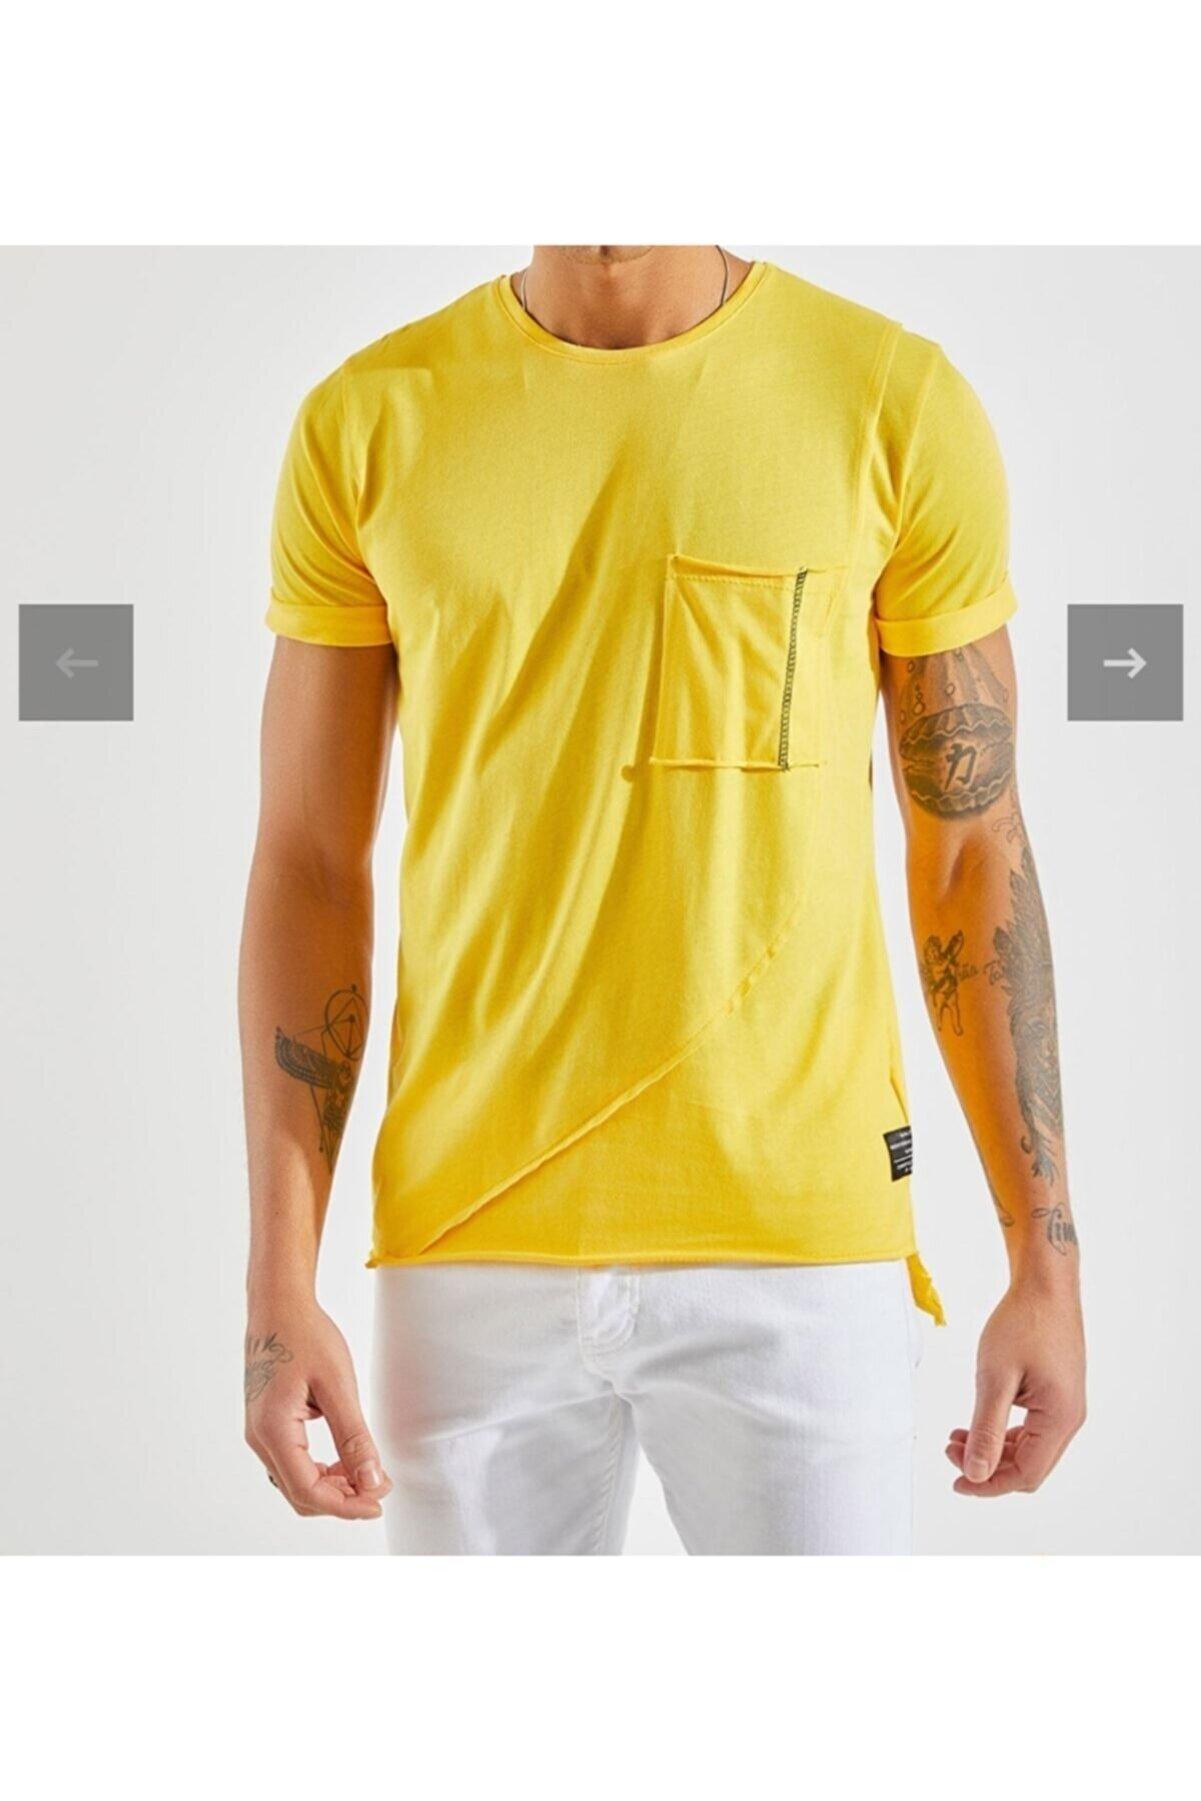 DURAN Erkek Man 2021 Model Sarı T-shirt